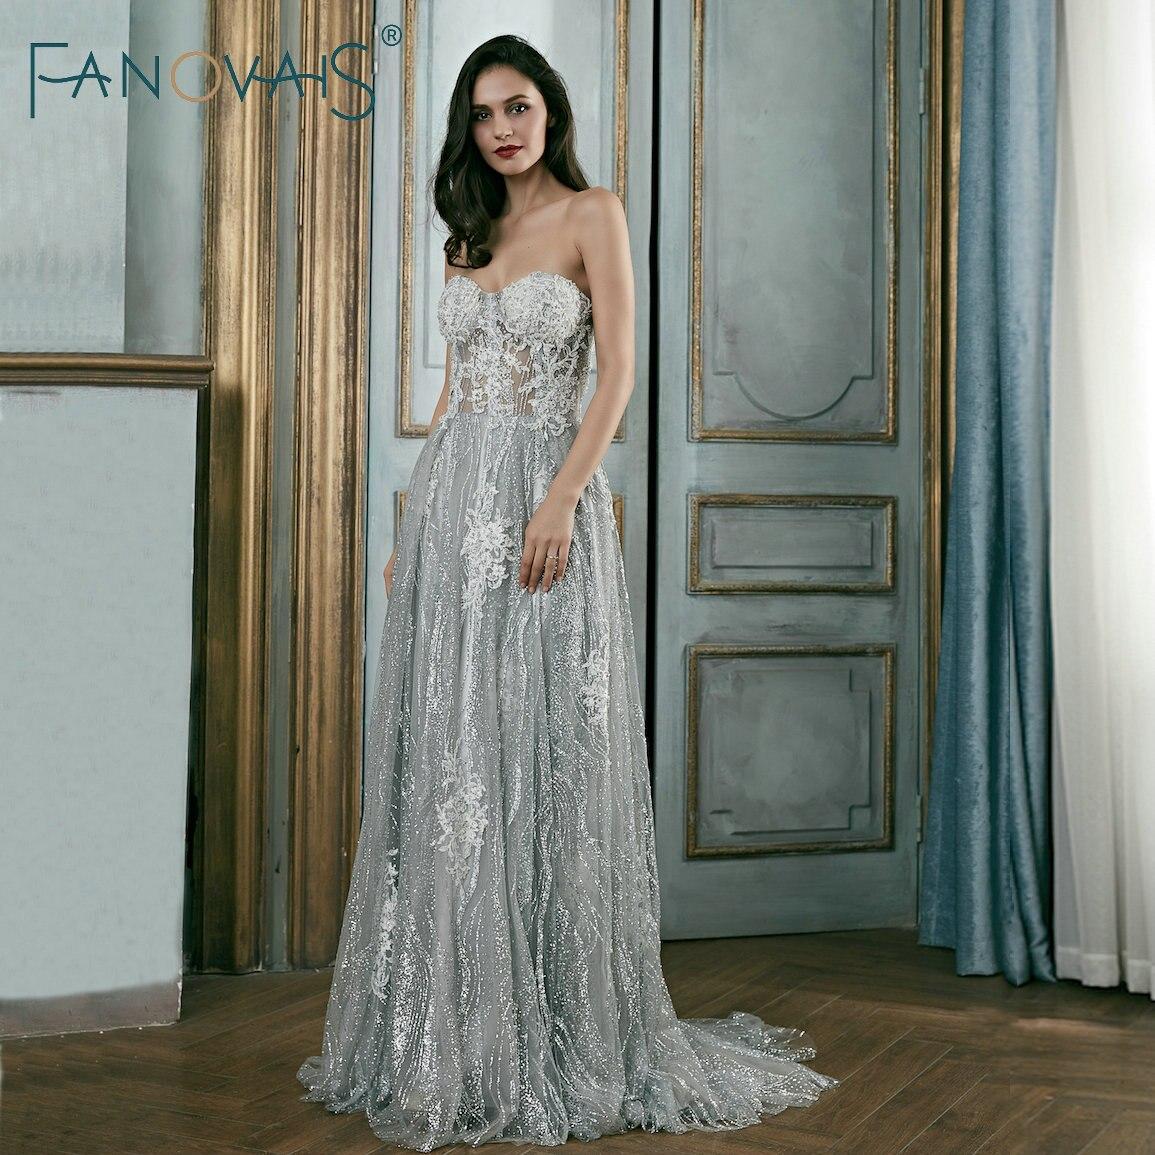 Silver Gray   Evening     Dresses   Glitter Fabric Special Occasion   Dress   Vestido De Festa Robe De Soiree   Evening     Dress   2019 Prom   Dress